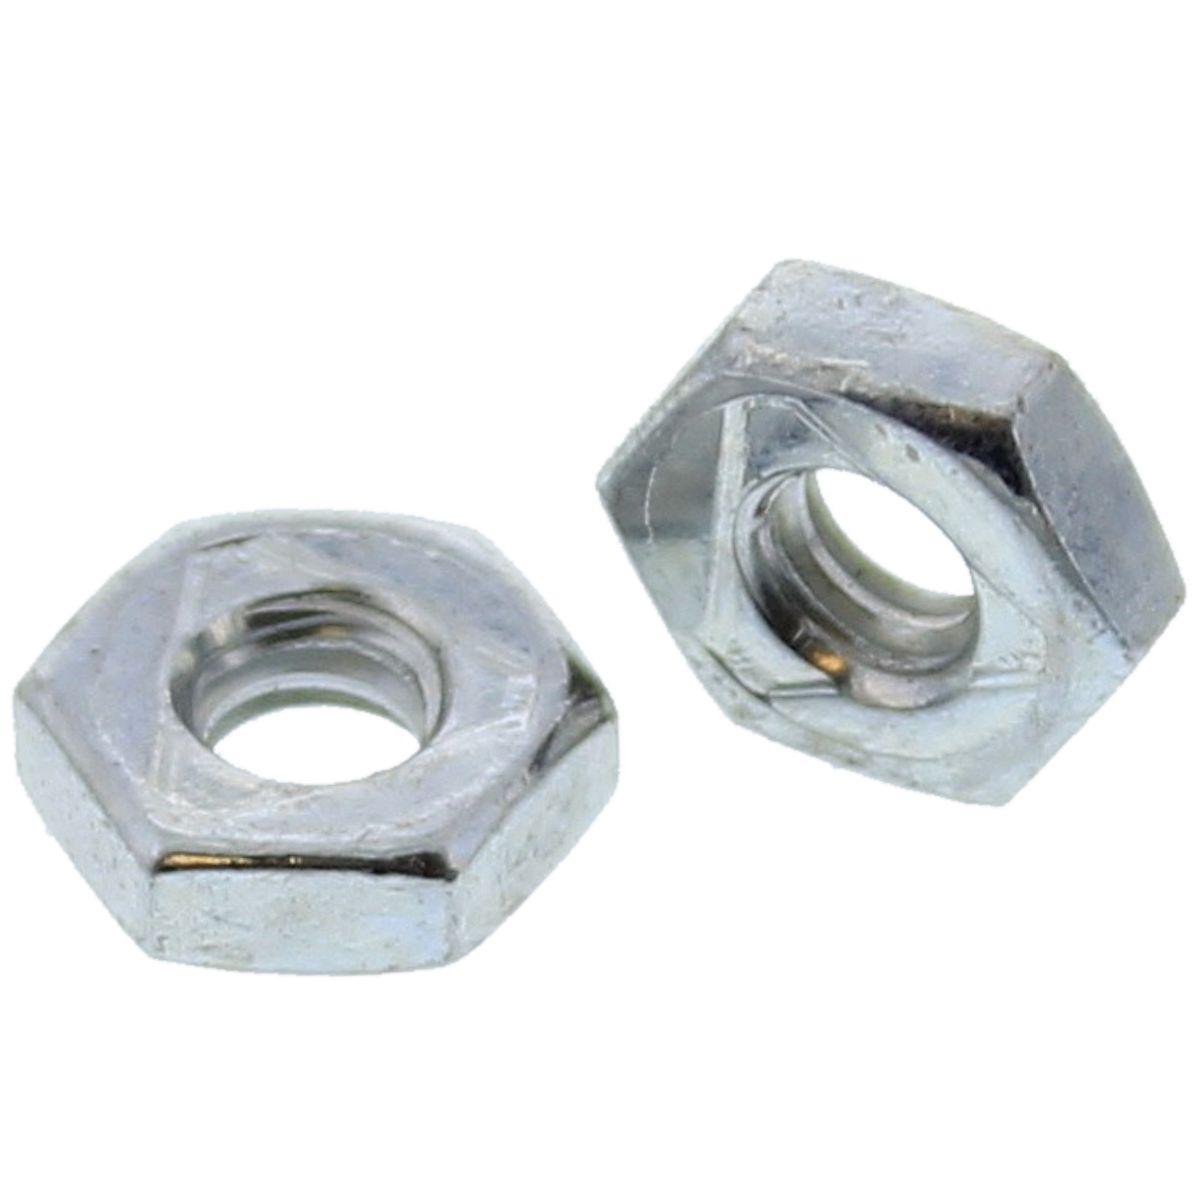 #10-32  Uni-Torque Locking Nuts — All Steel Grade A, Fine, Zinc & Waxed, 100/PKG